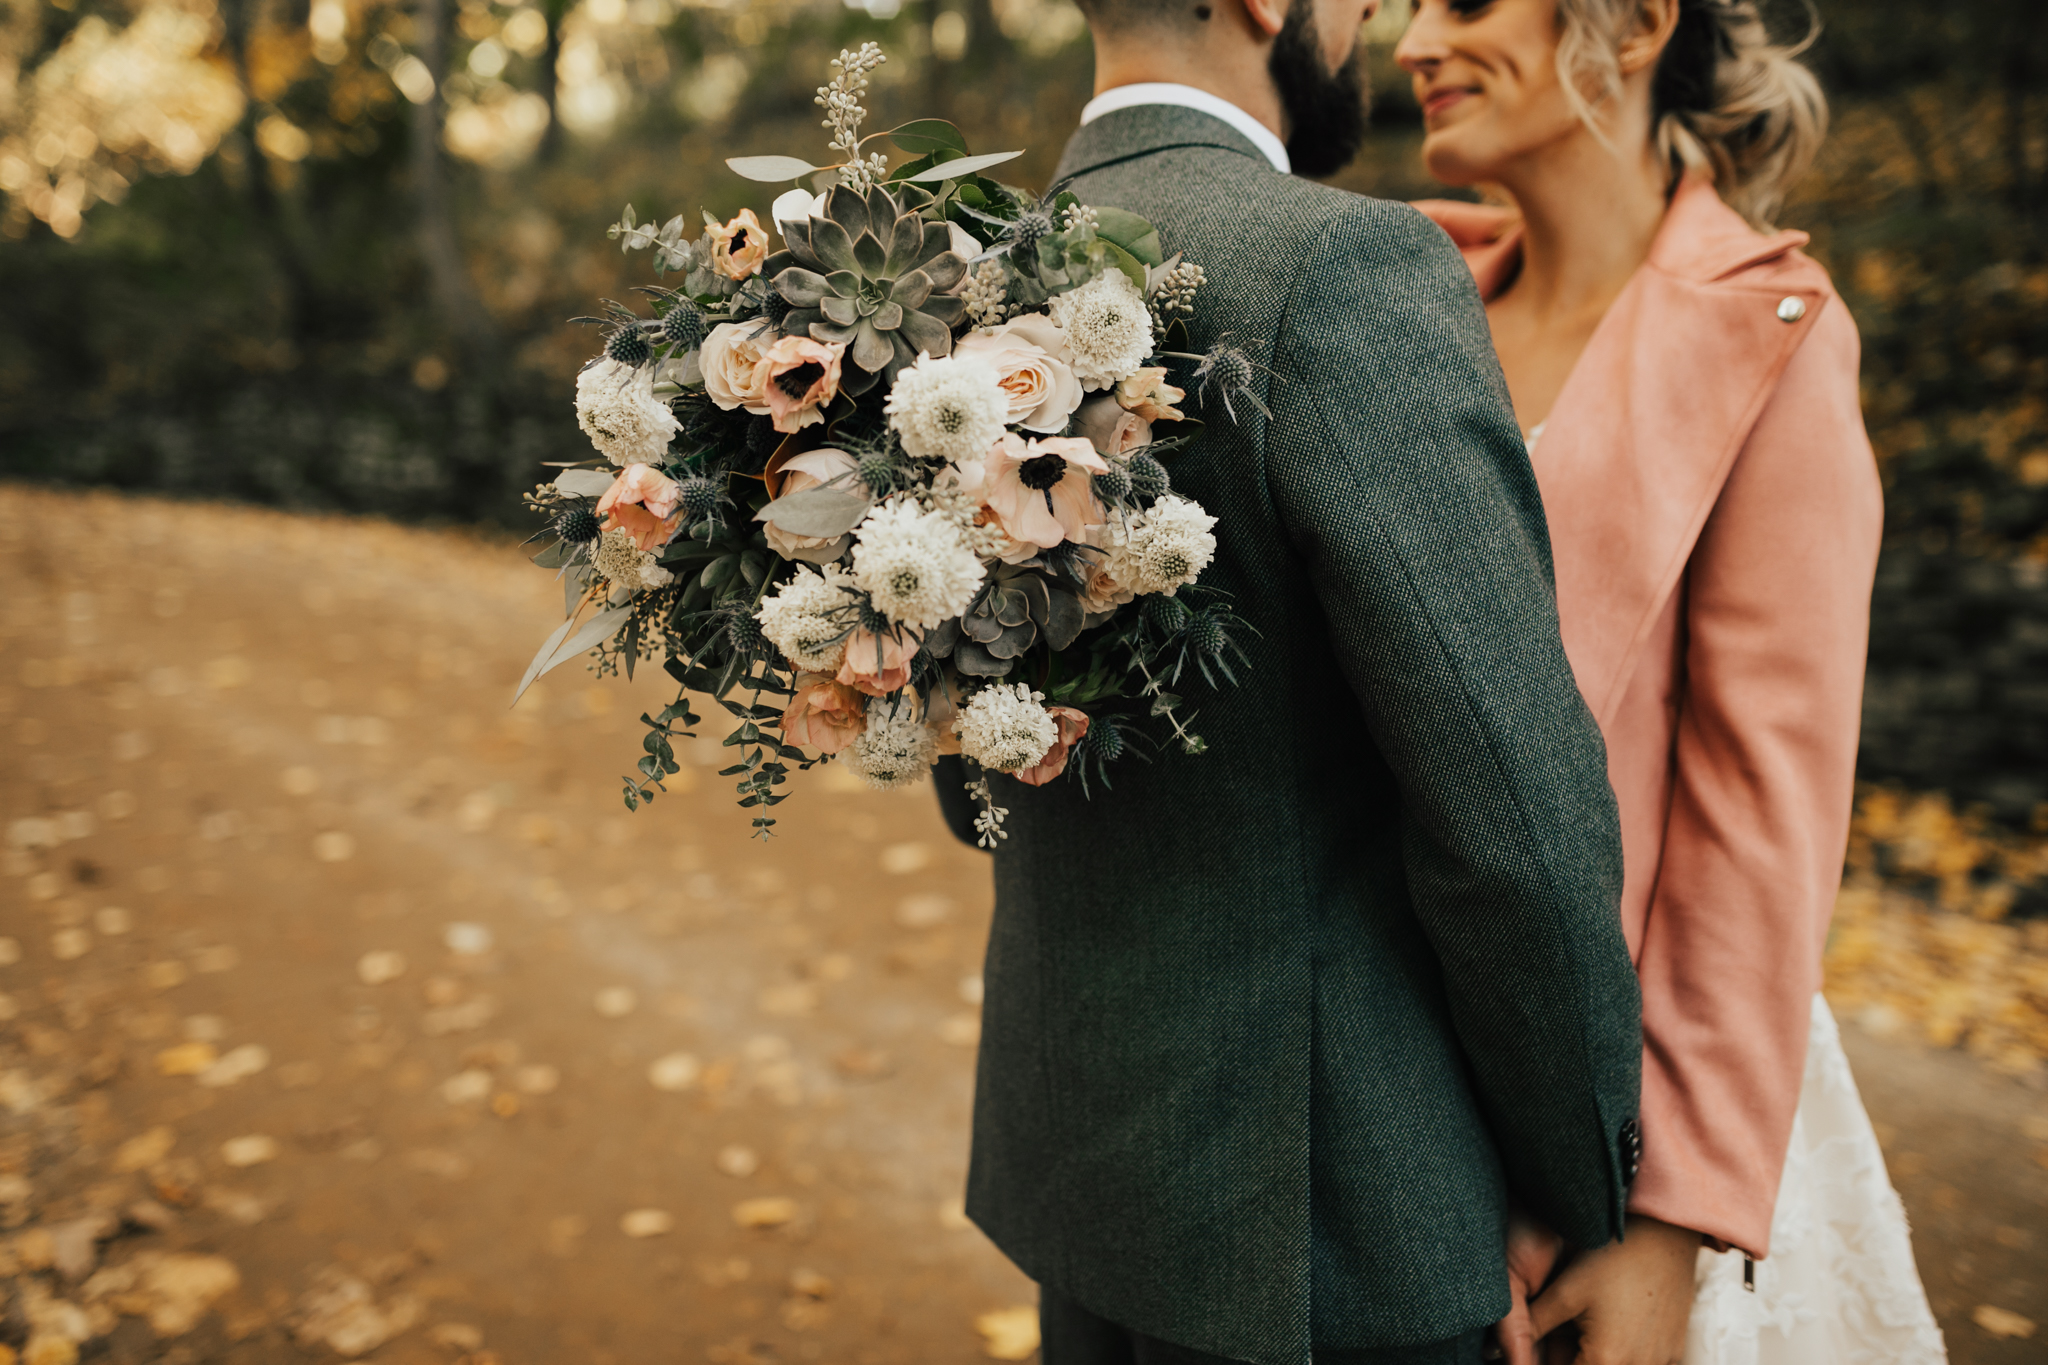 Rad Couples weddings new york